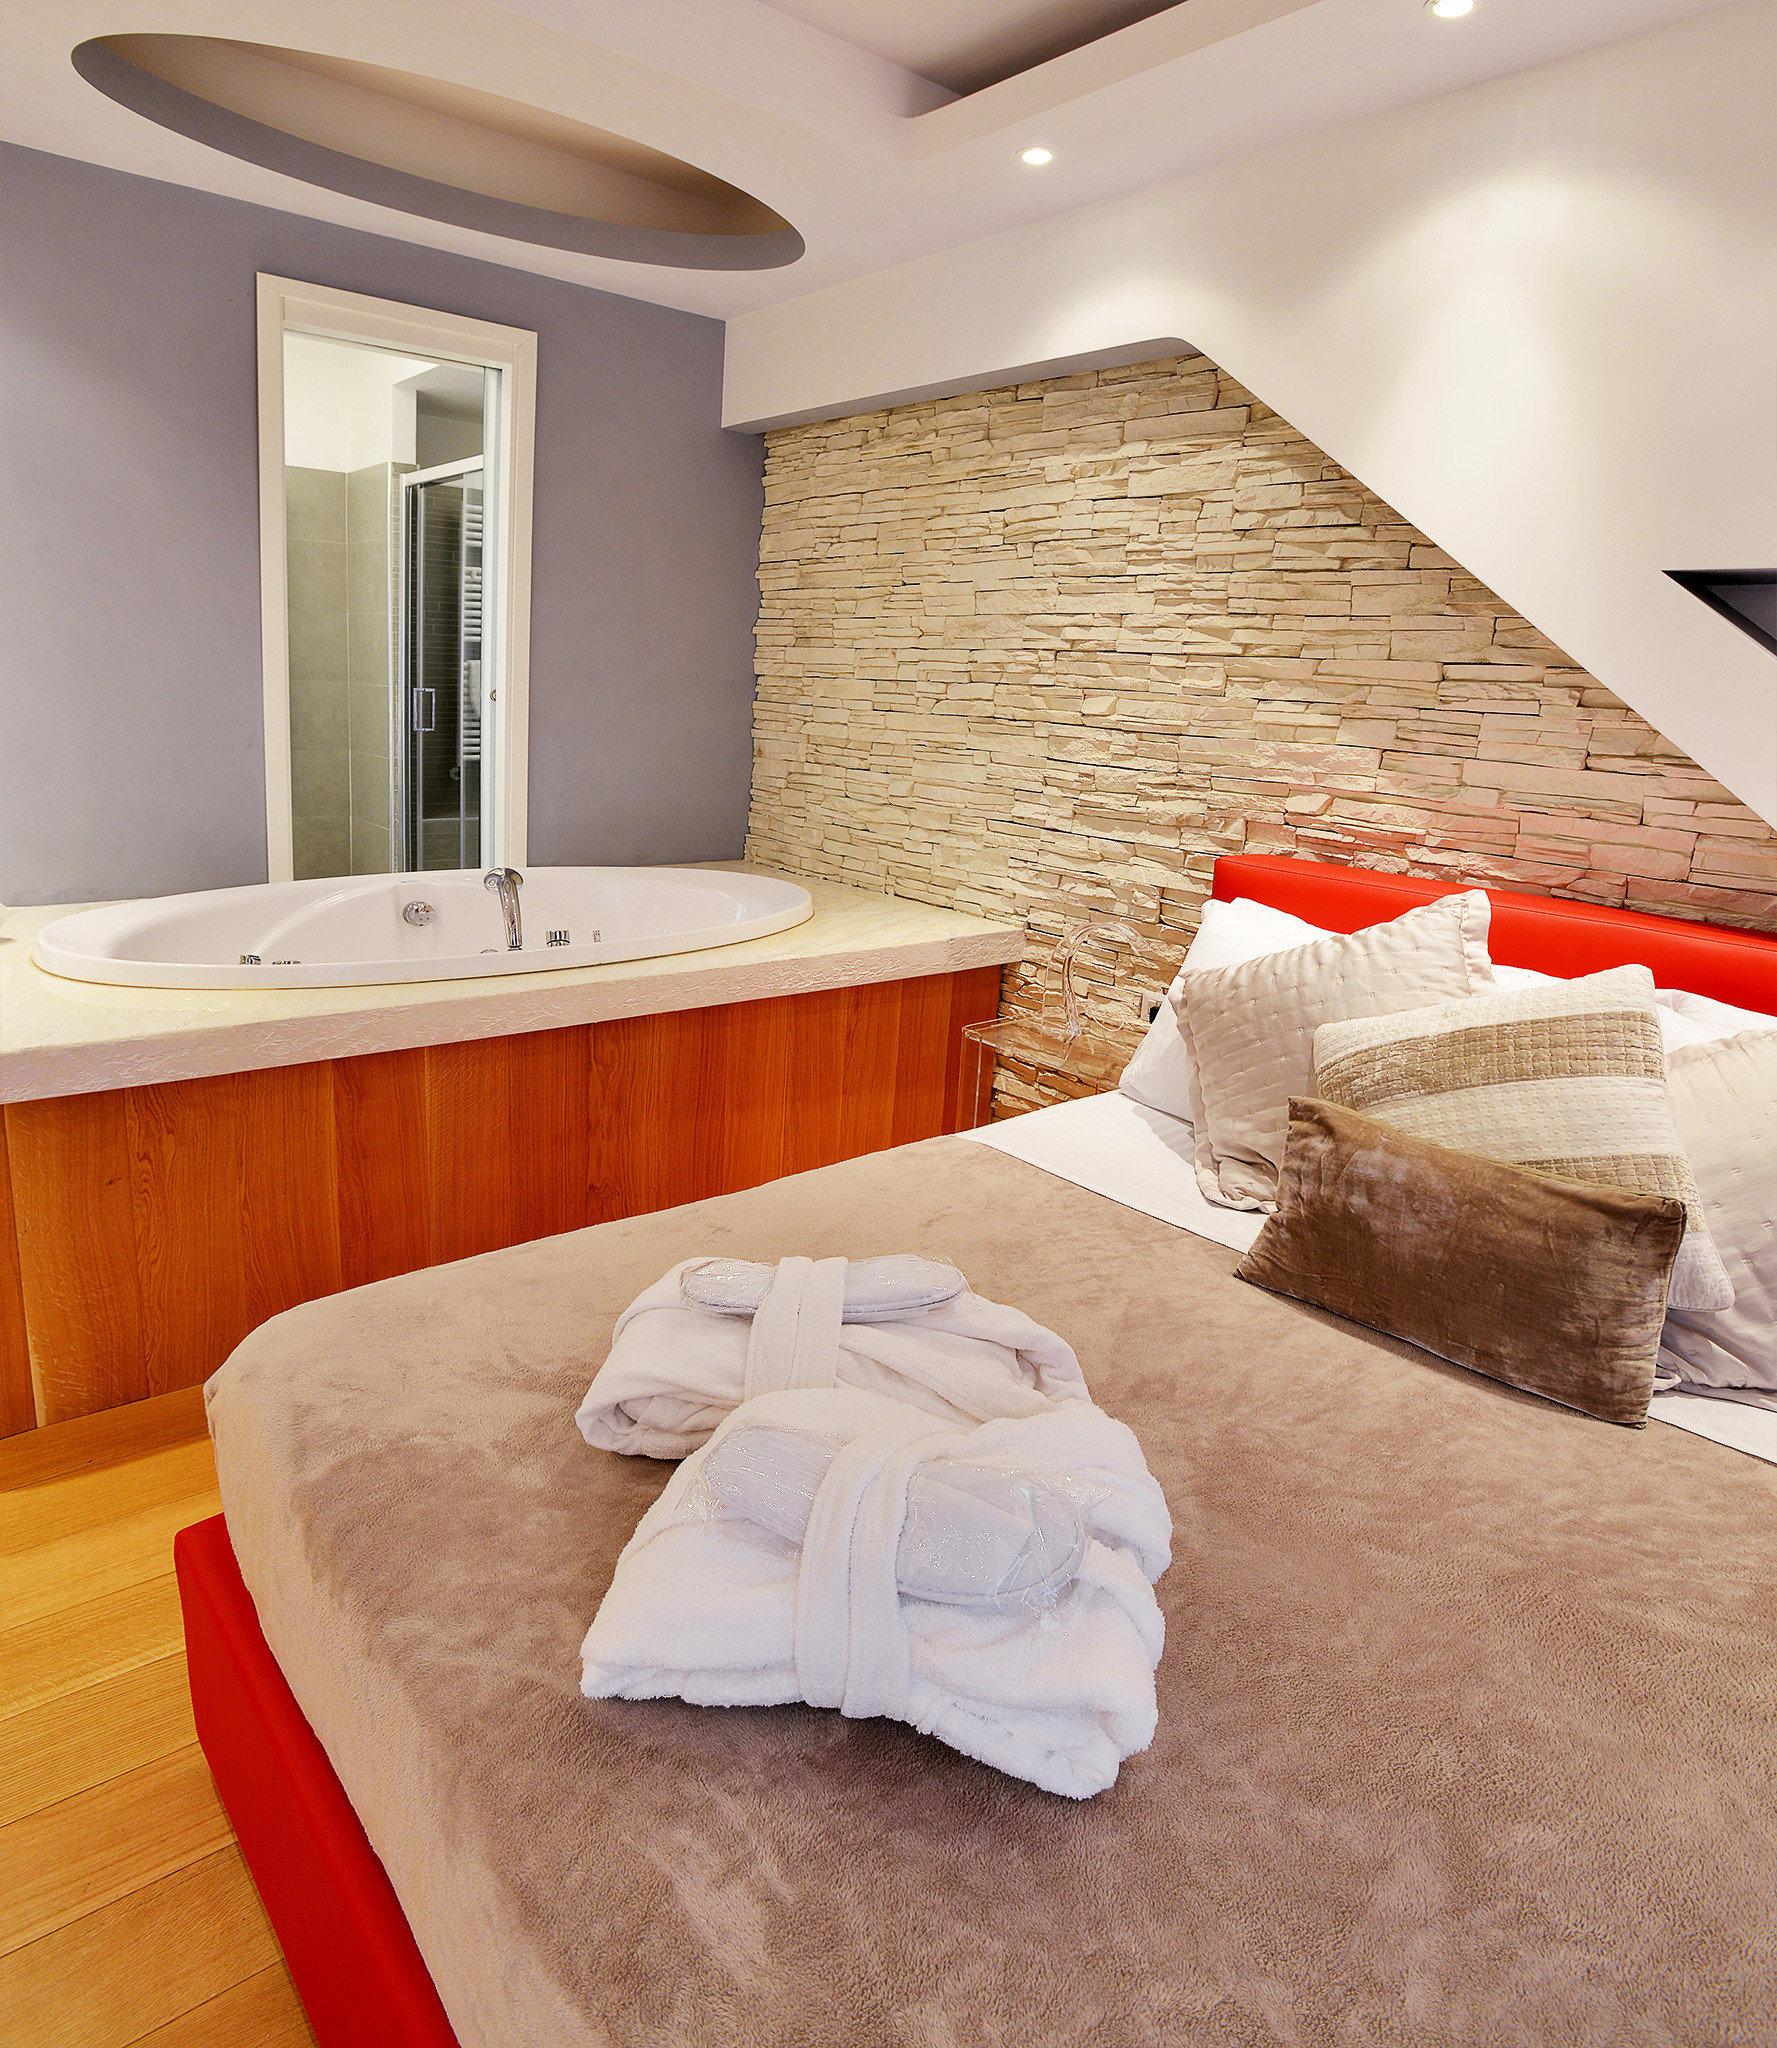 B&B Bath Bedroom City property Suite flooring cottage bed sheet